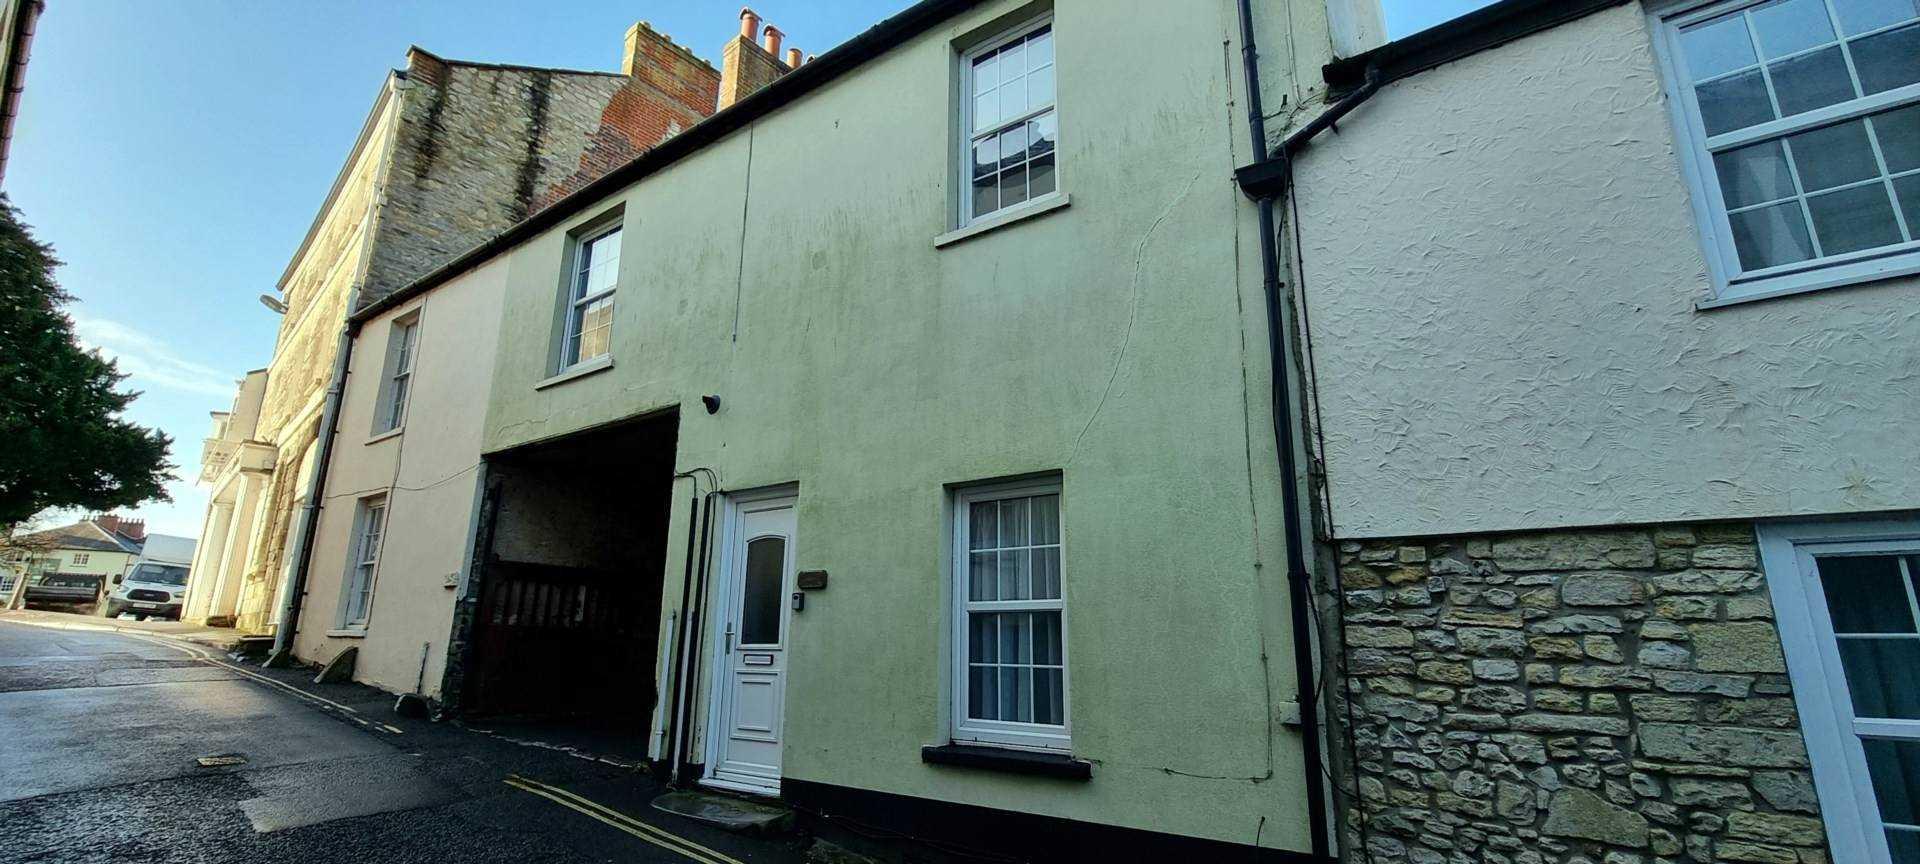 Castle Street, Axminster, Image 1